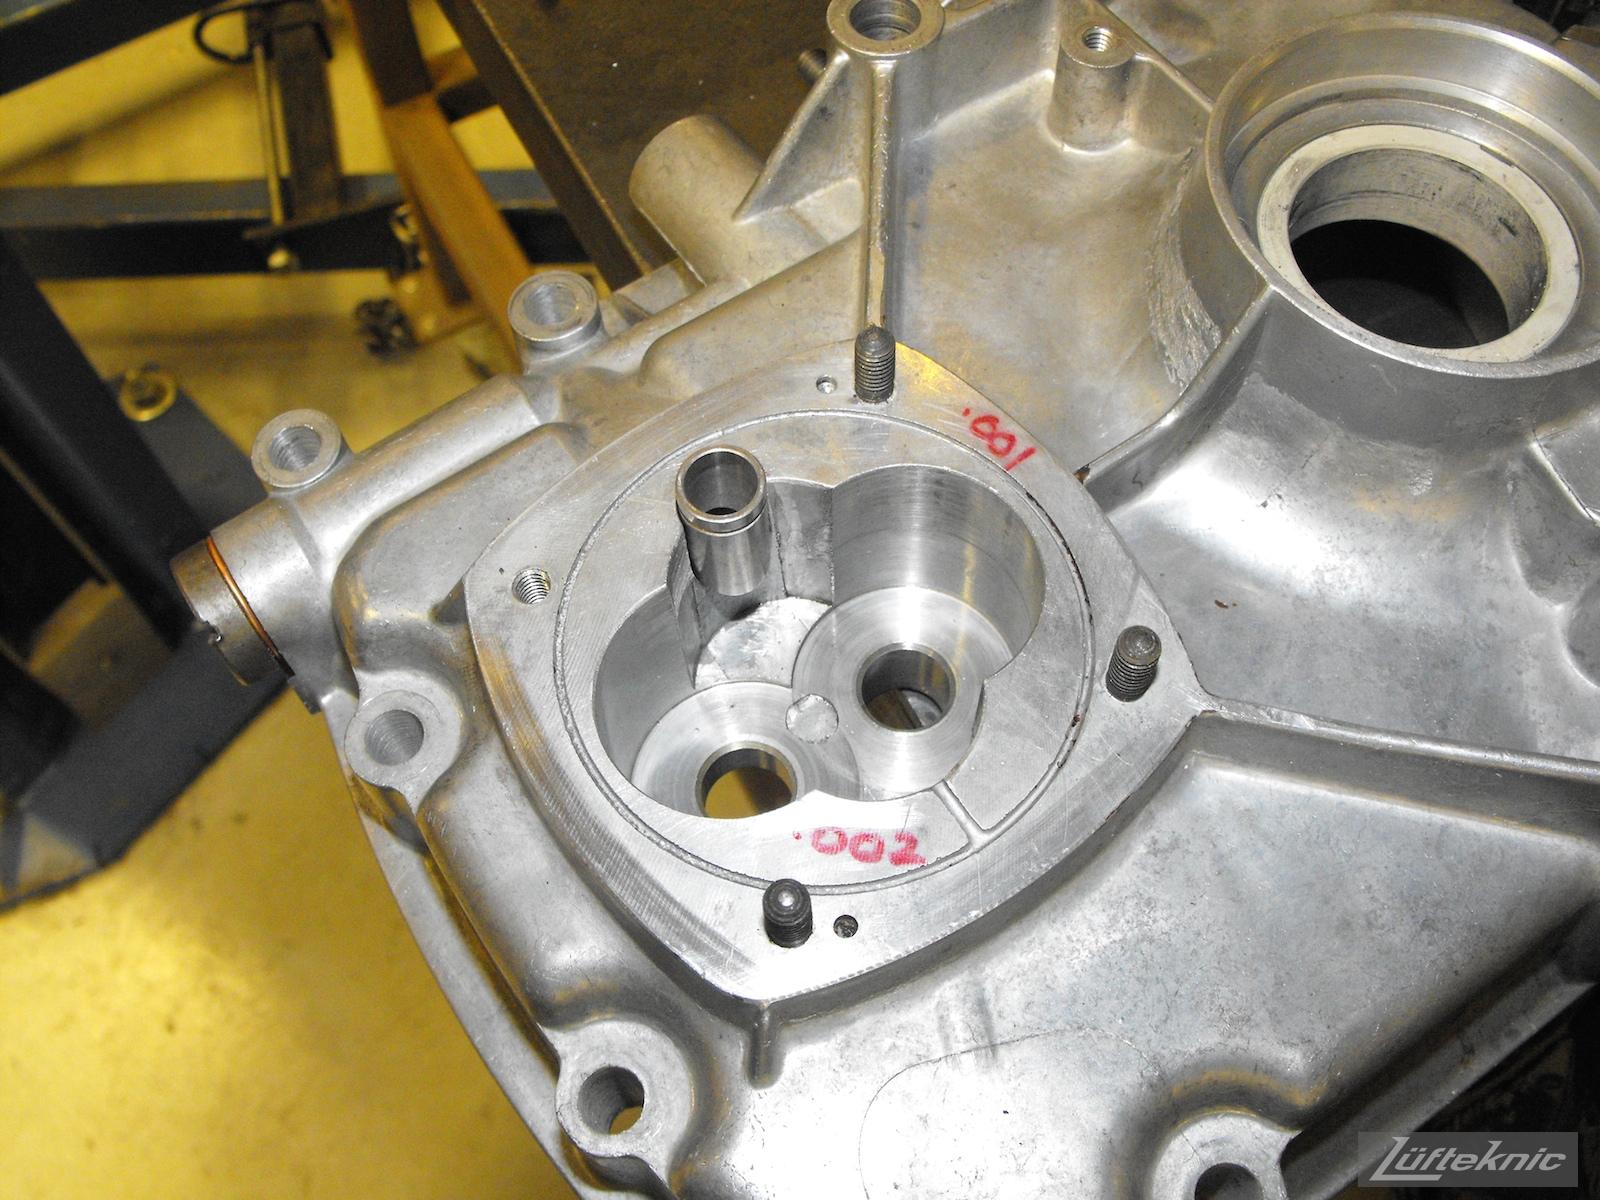 Engine reassembly for an Irish Green Porsche 912 undergoing restoration at Lufteknic.